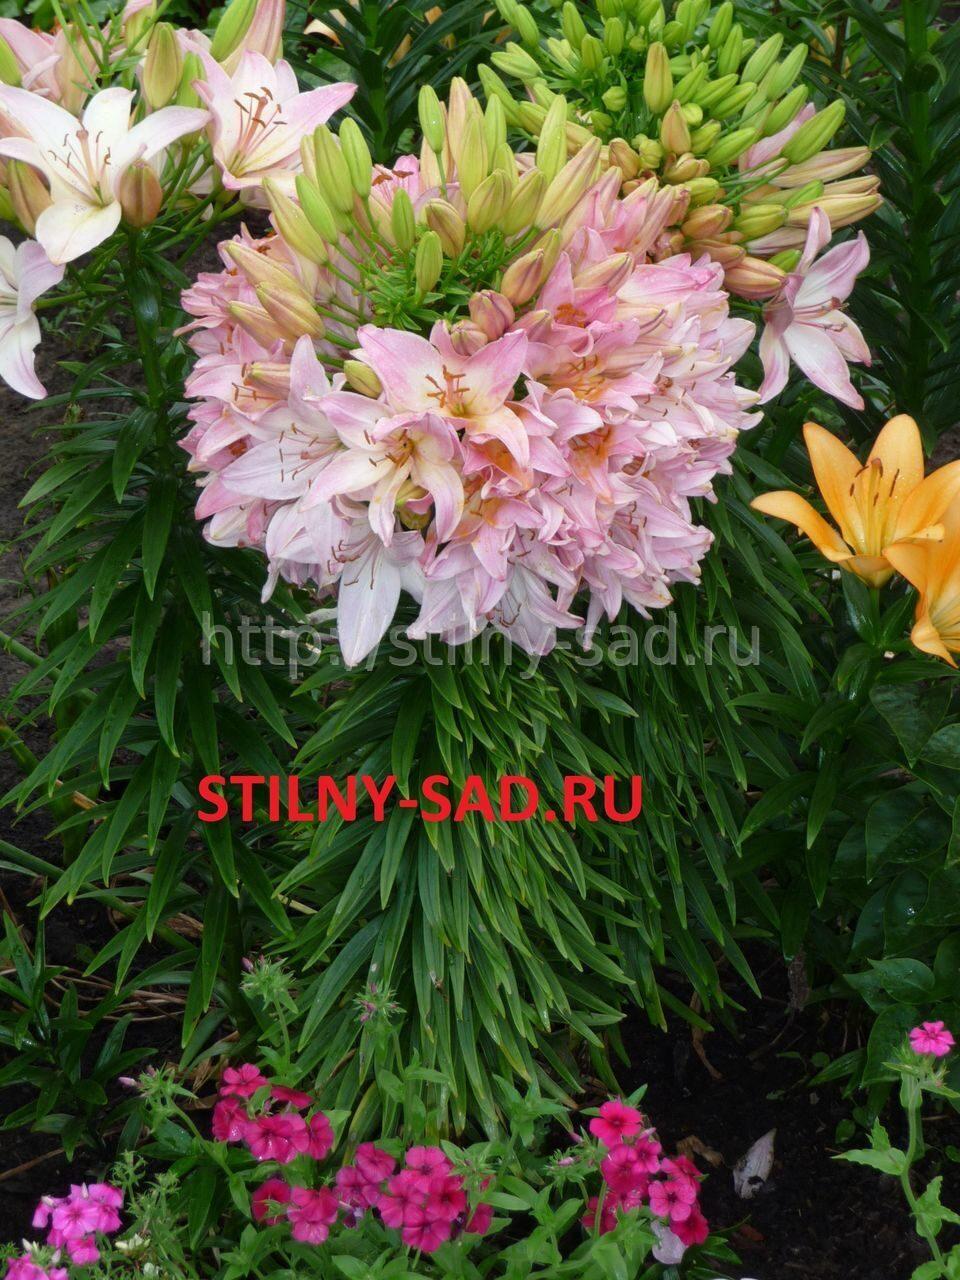 цветов многолетних: flowerf.ru/index.php/868-foto-cvetov-mnogoletnih